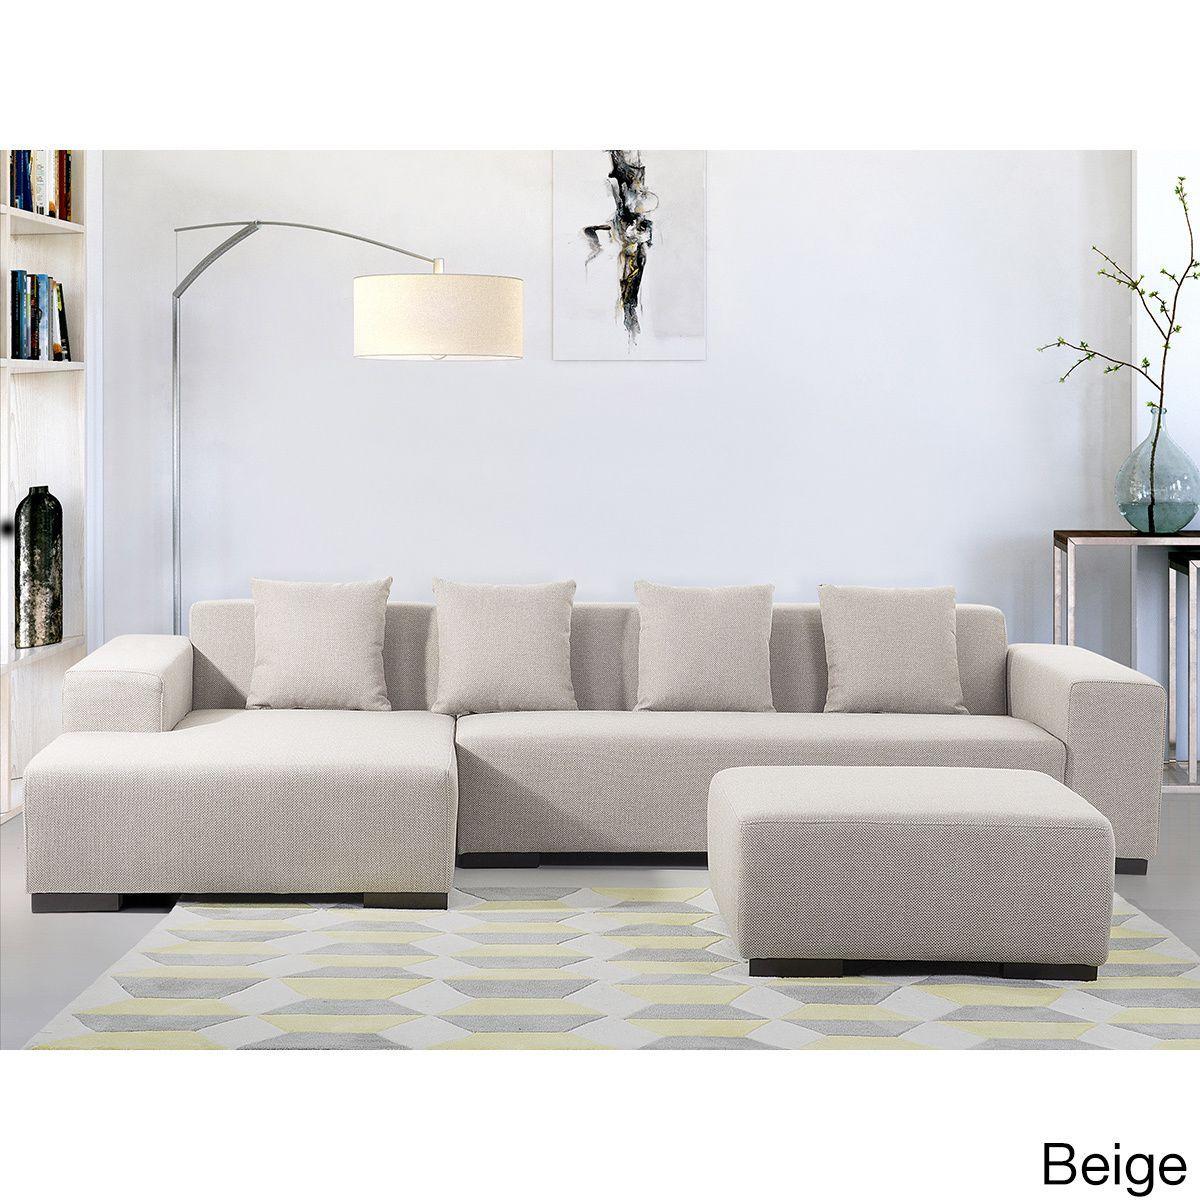 Beliani Lungo Modern Fabric Sectional Sofa (Lungo Beige R w/ottoman) (Polyester)